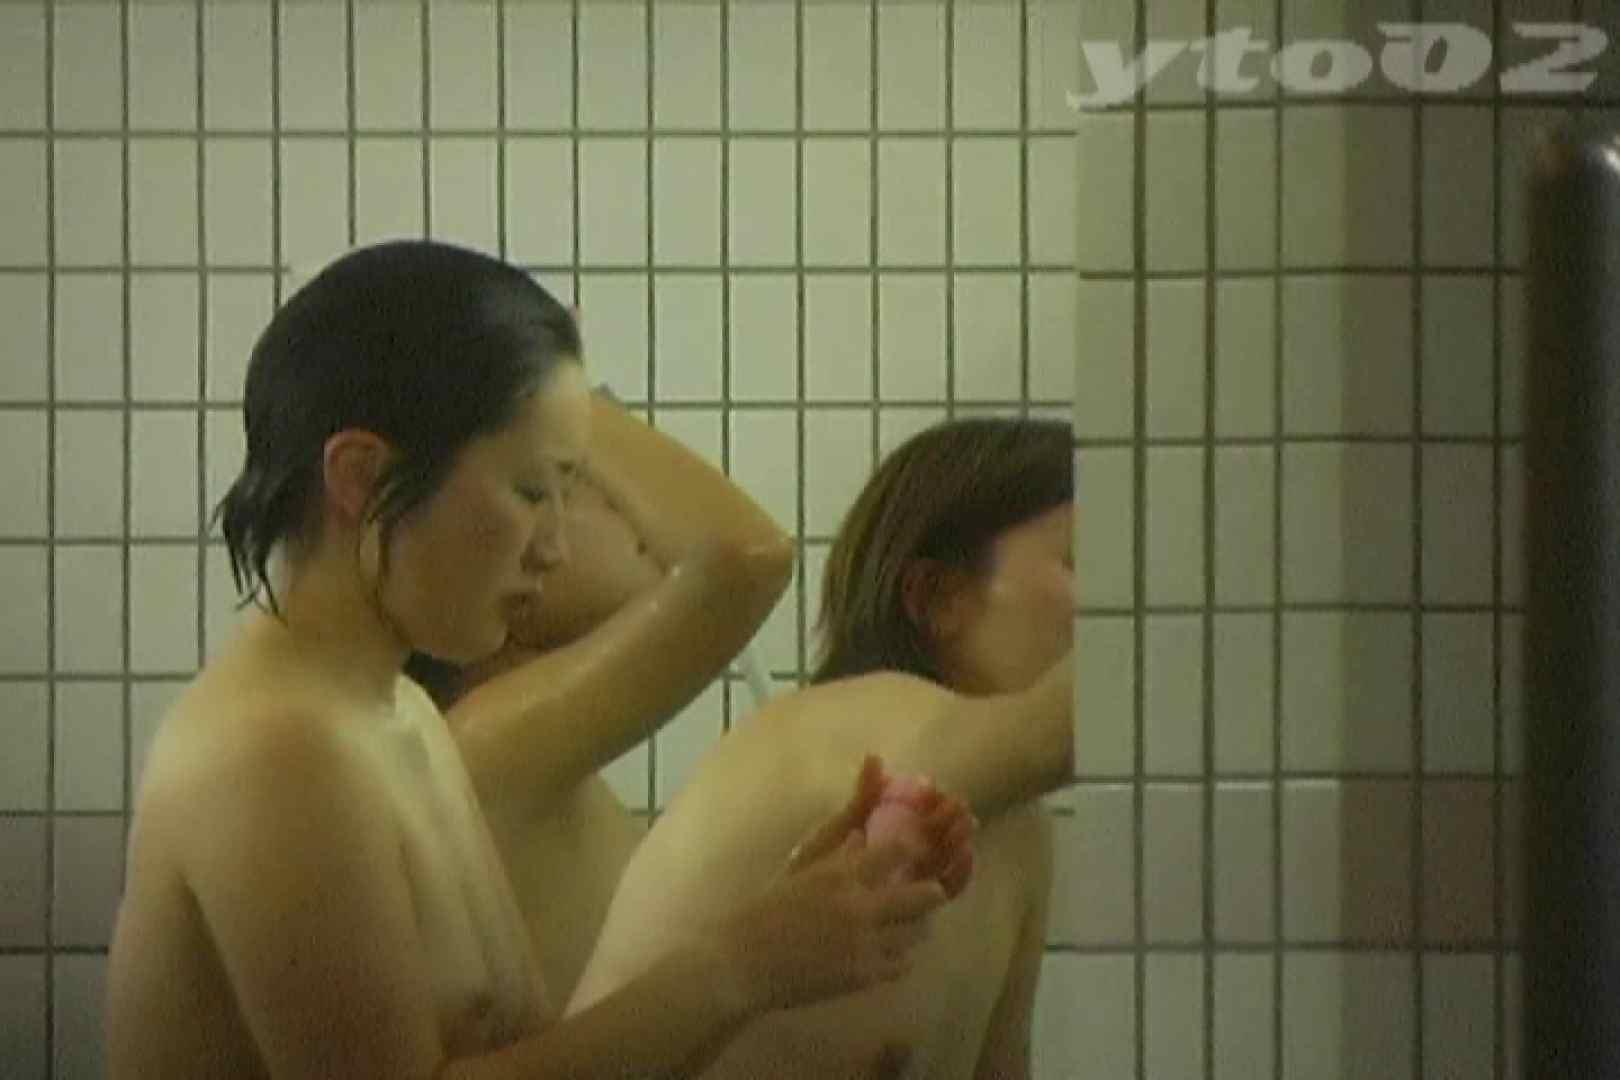 ▲復活限定▲合宿ホテル女風呂盗撮 Vol.11 入浴  79pic 4